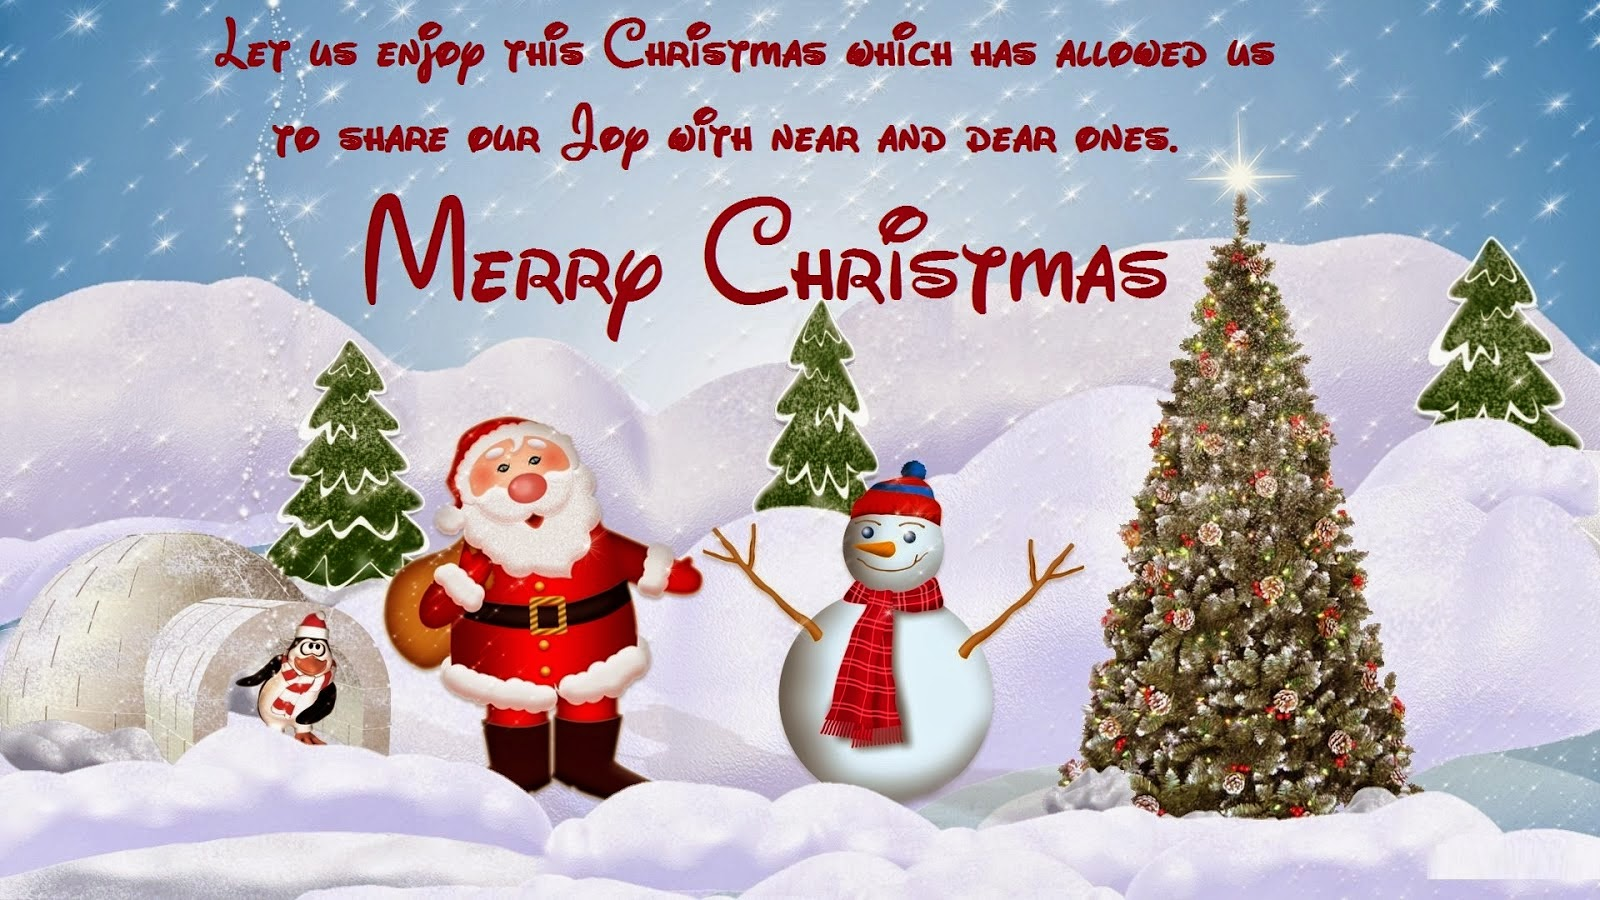 bermanfaat dan selamat hari natal 400 x 301 44 kb jpeg perayaan natal